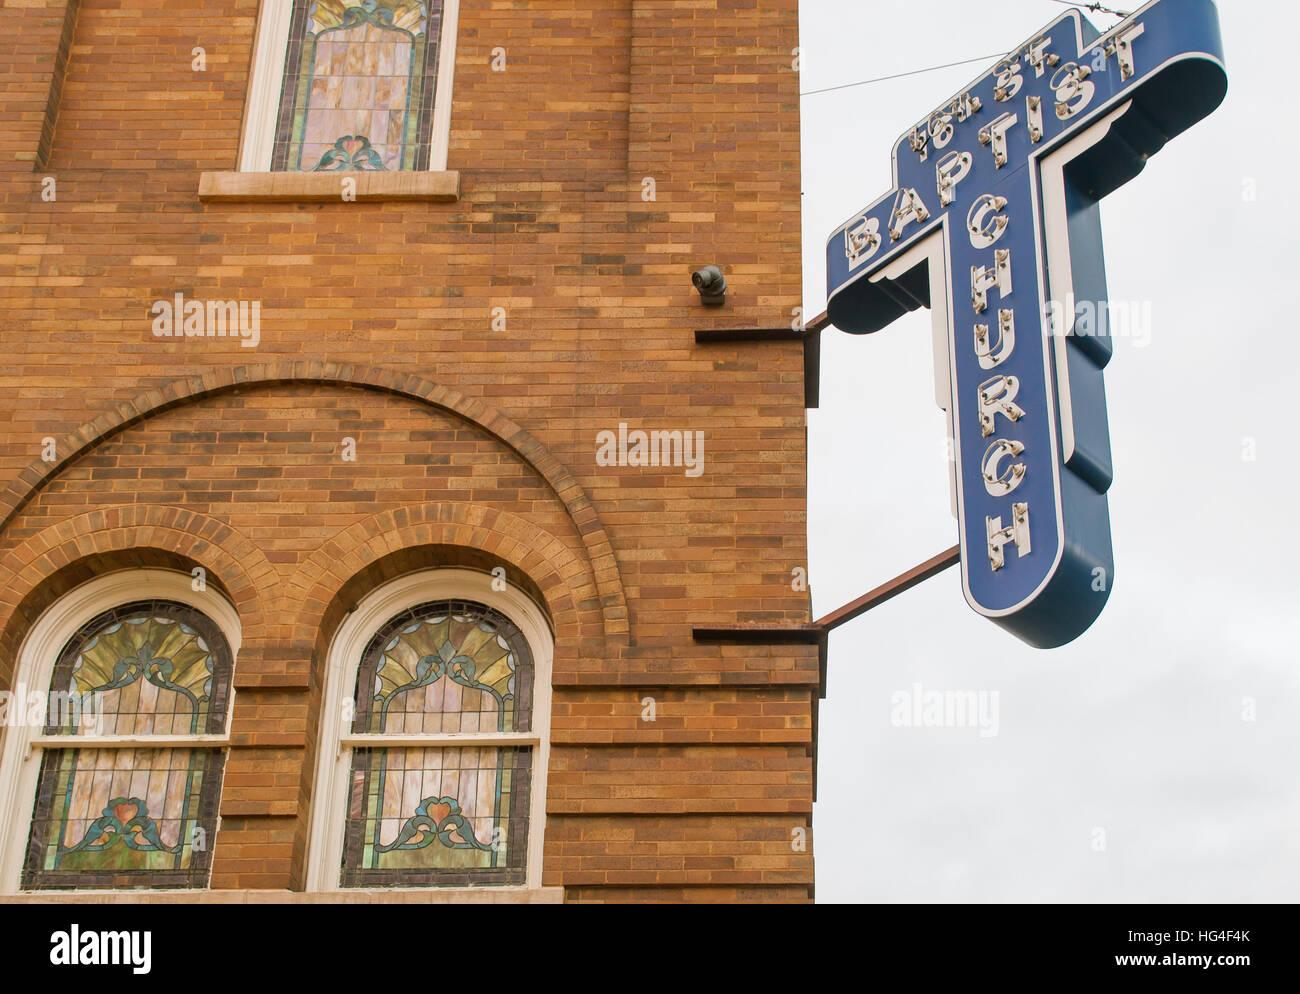 16th Street Baptist church sign in Birmingham Alabama USA Stock Photo